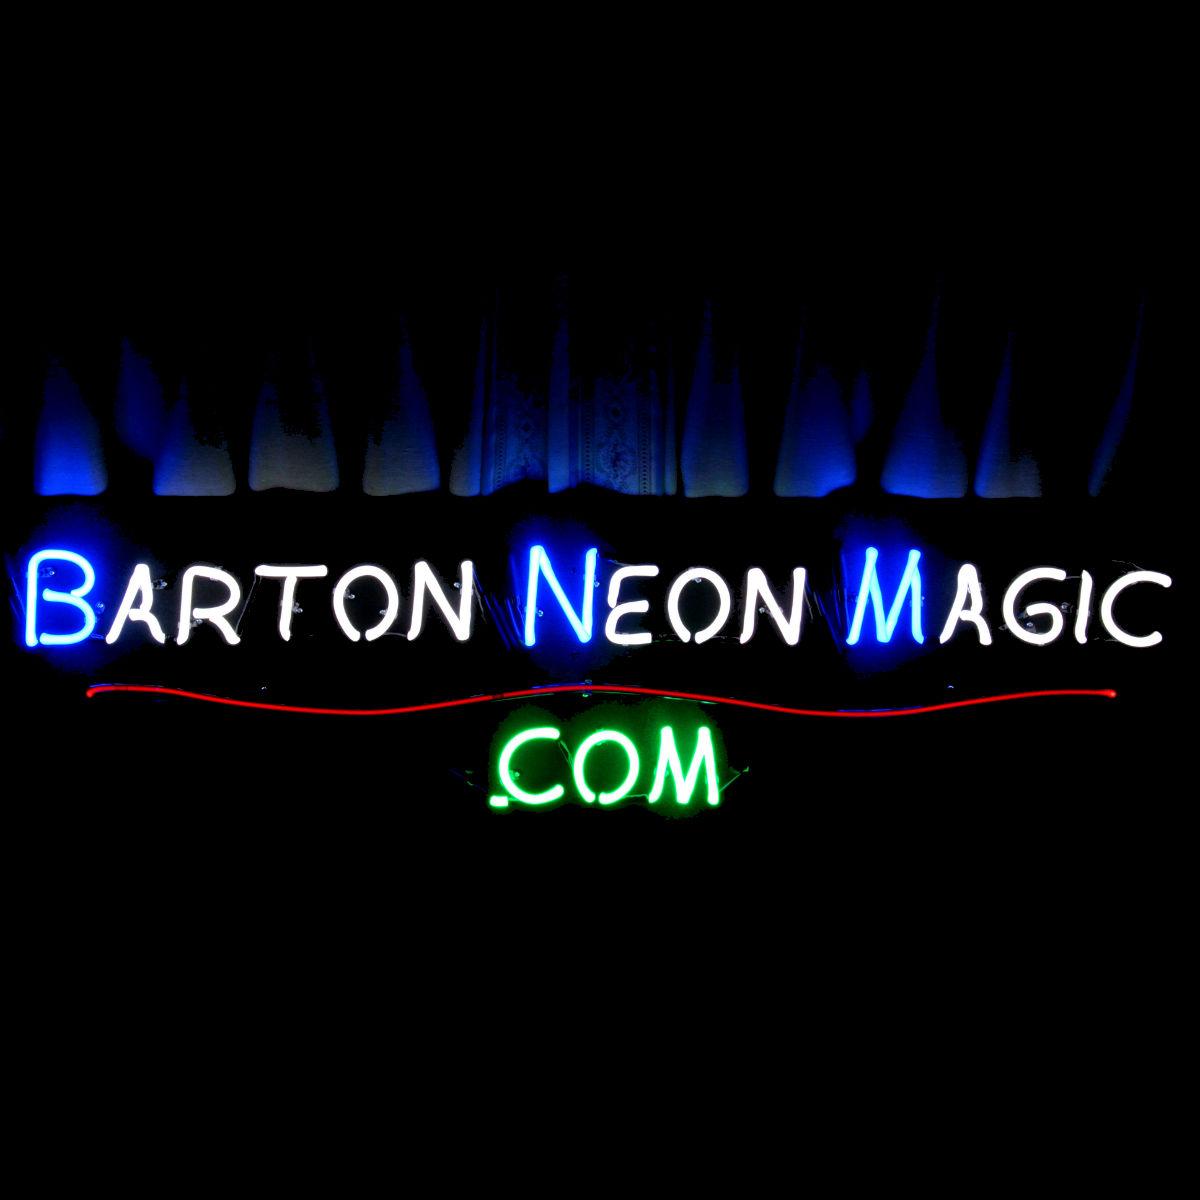 Finest Quality Custom Automotive Neon Signs by John Barton - Internationally Renowned USA Neon Glass Artist - BartonNeonMagic.com